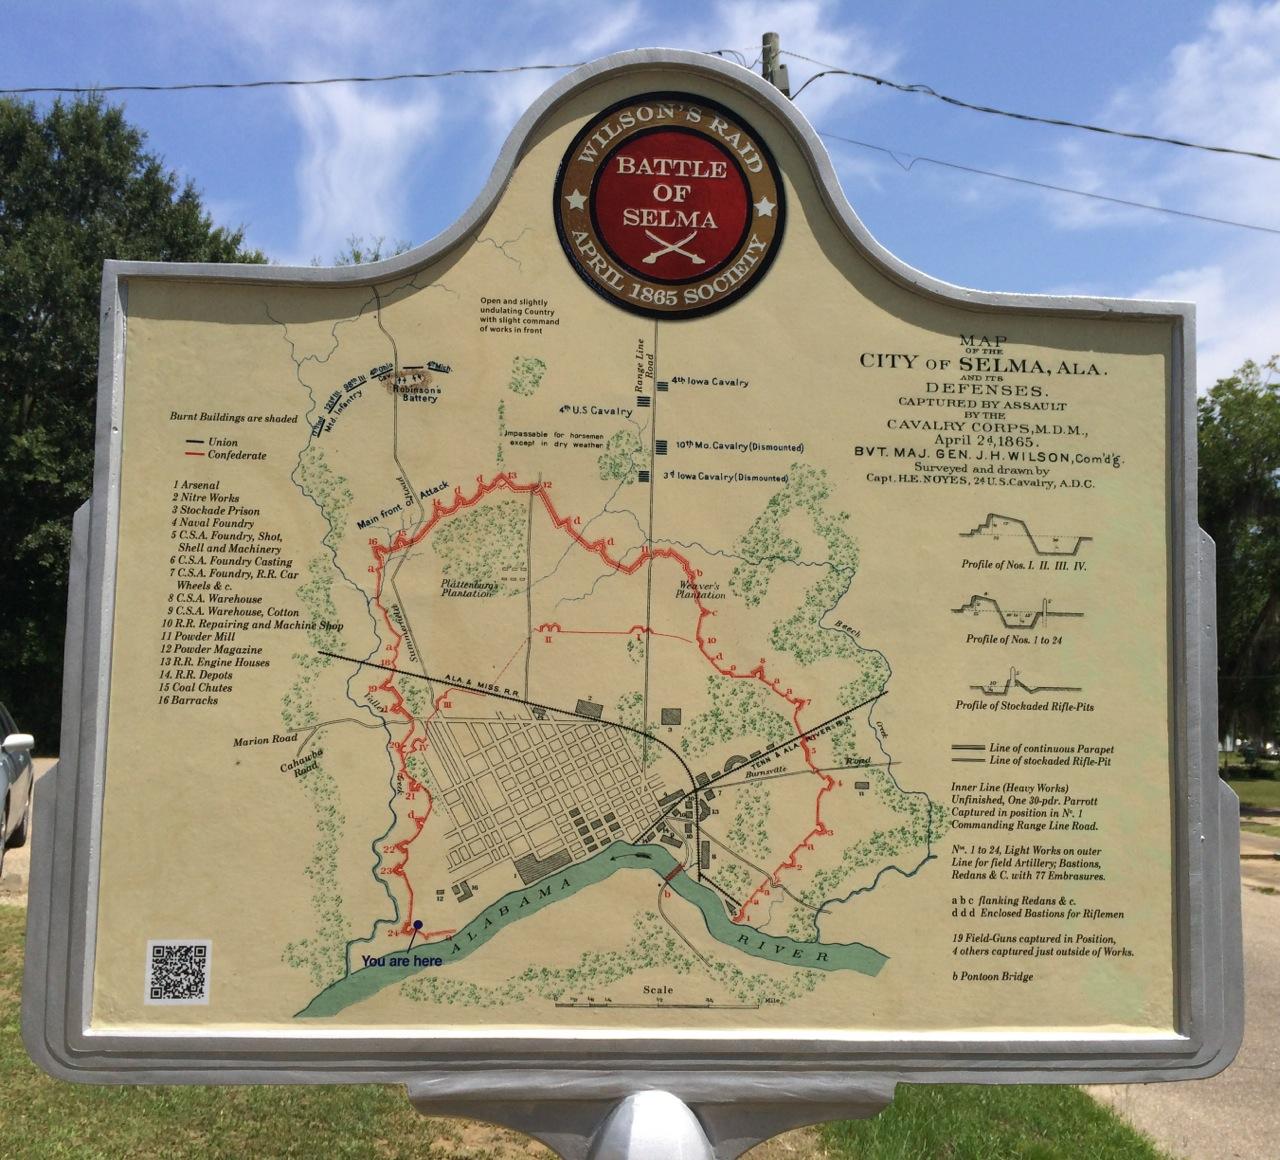 Selma Alabama Map of Defenses on April 2, 1865